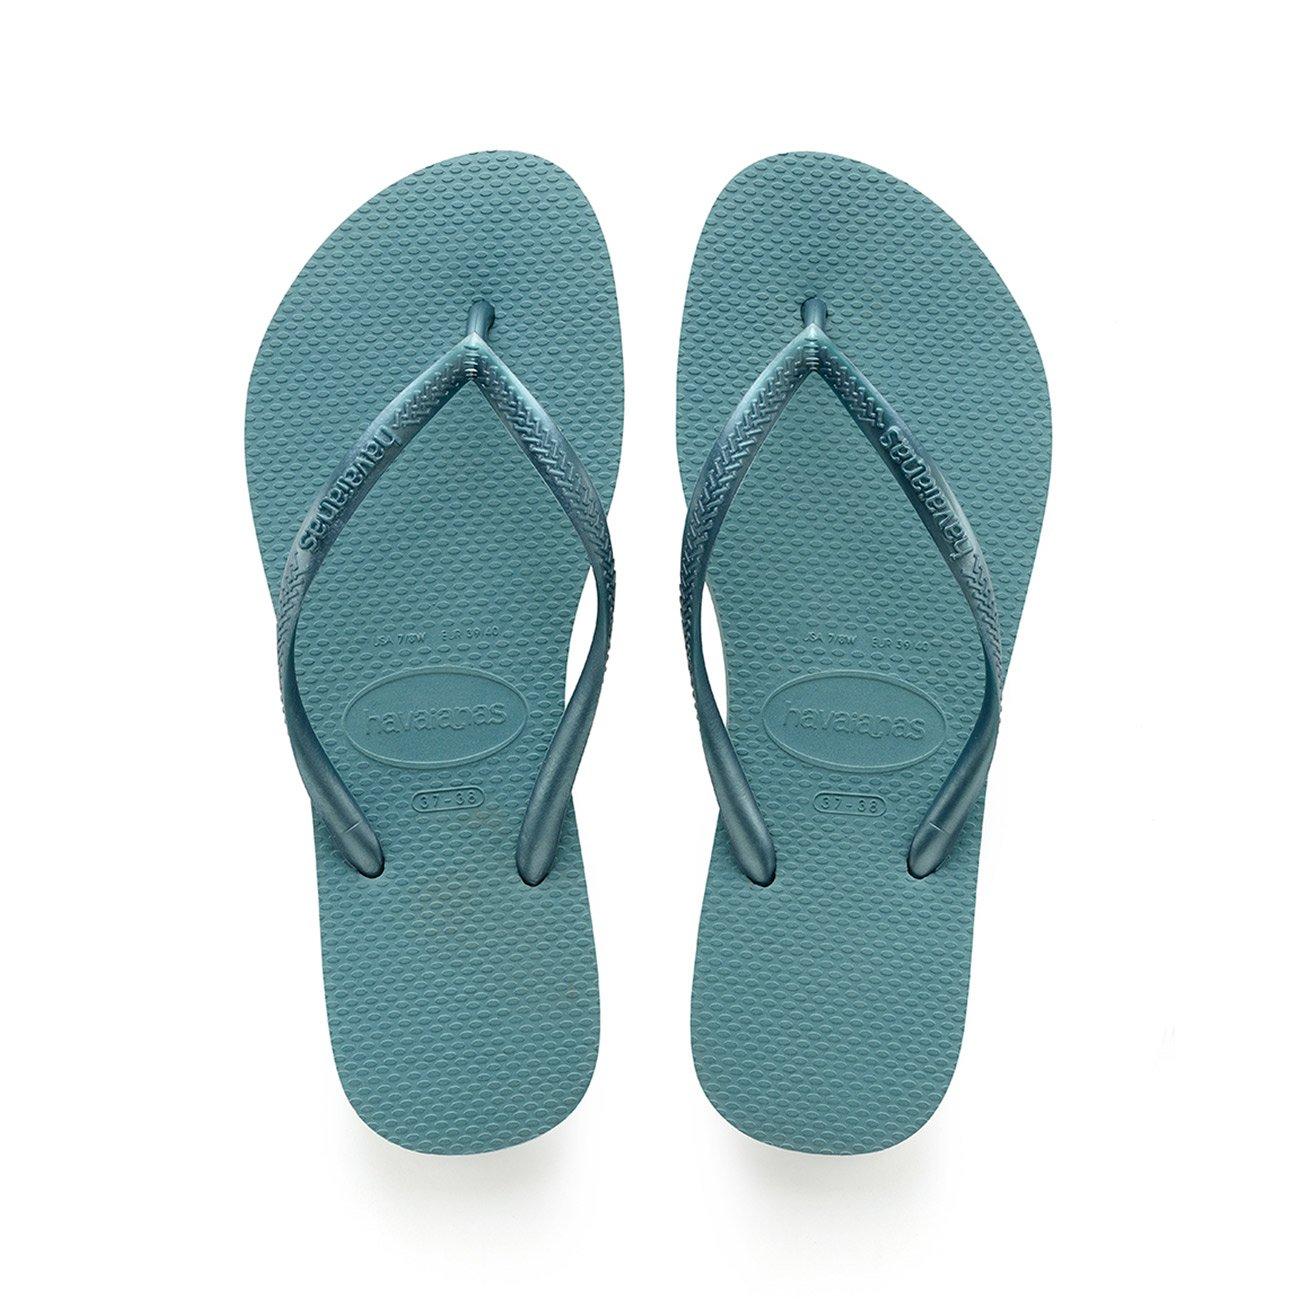 Schuhe Online Kaufen Herren Havaianas Halbschuhe Schwarz